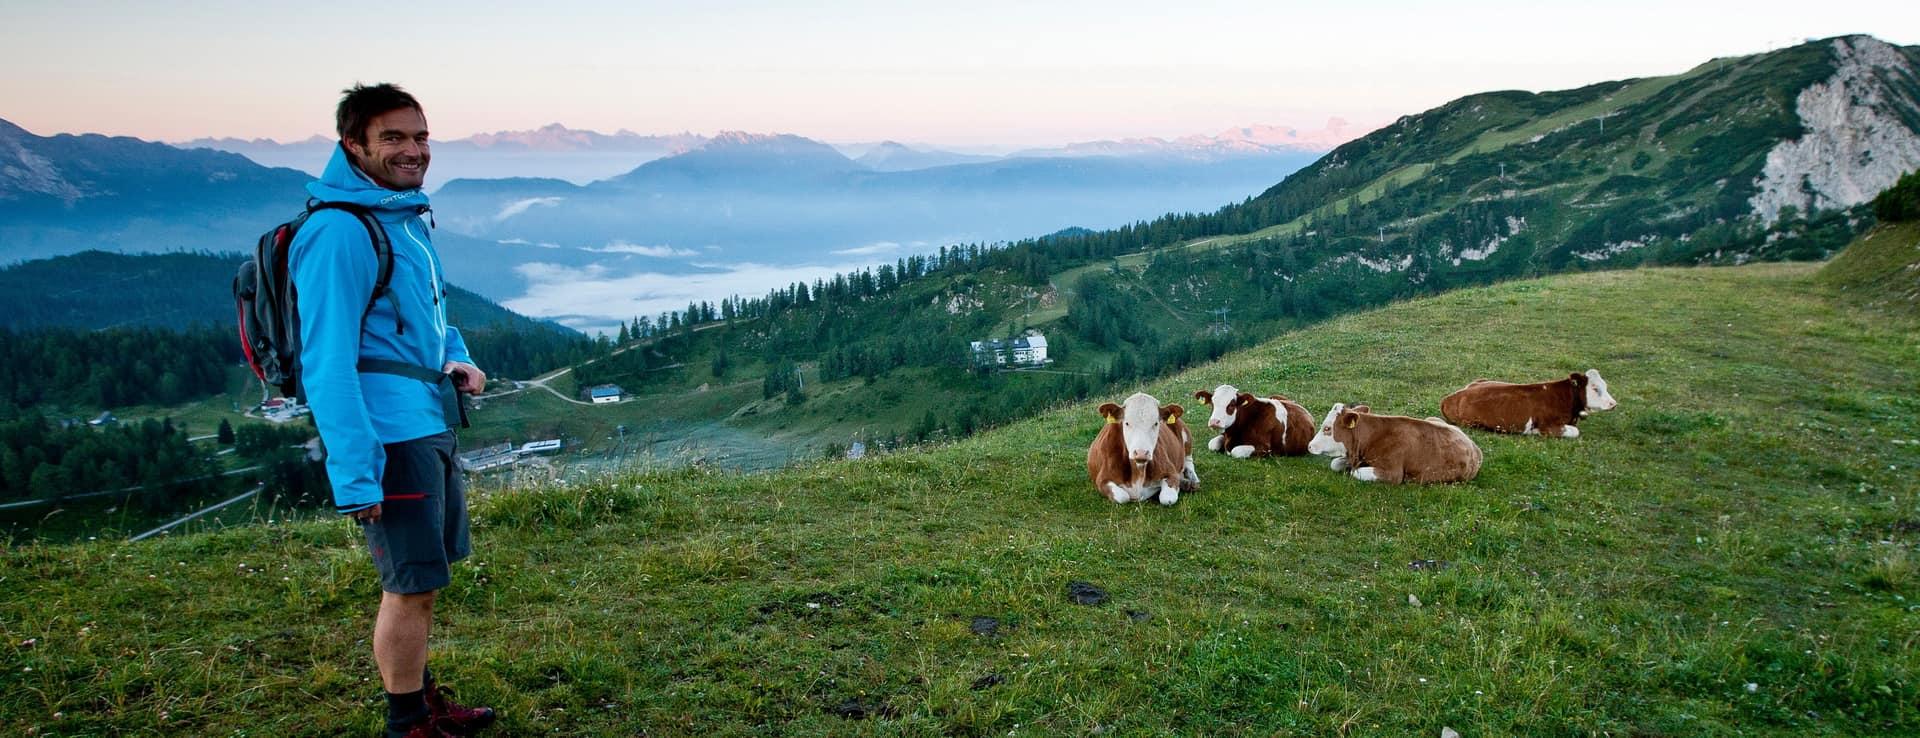 Vandrare Dachstein Österrike Semester Alperna